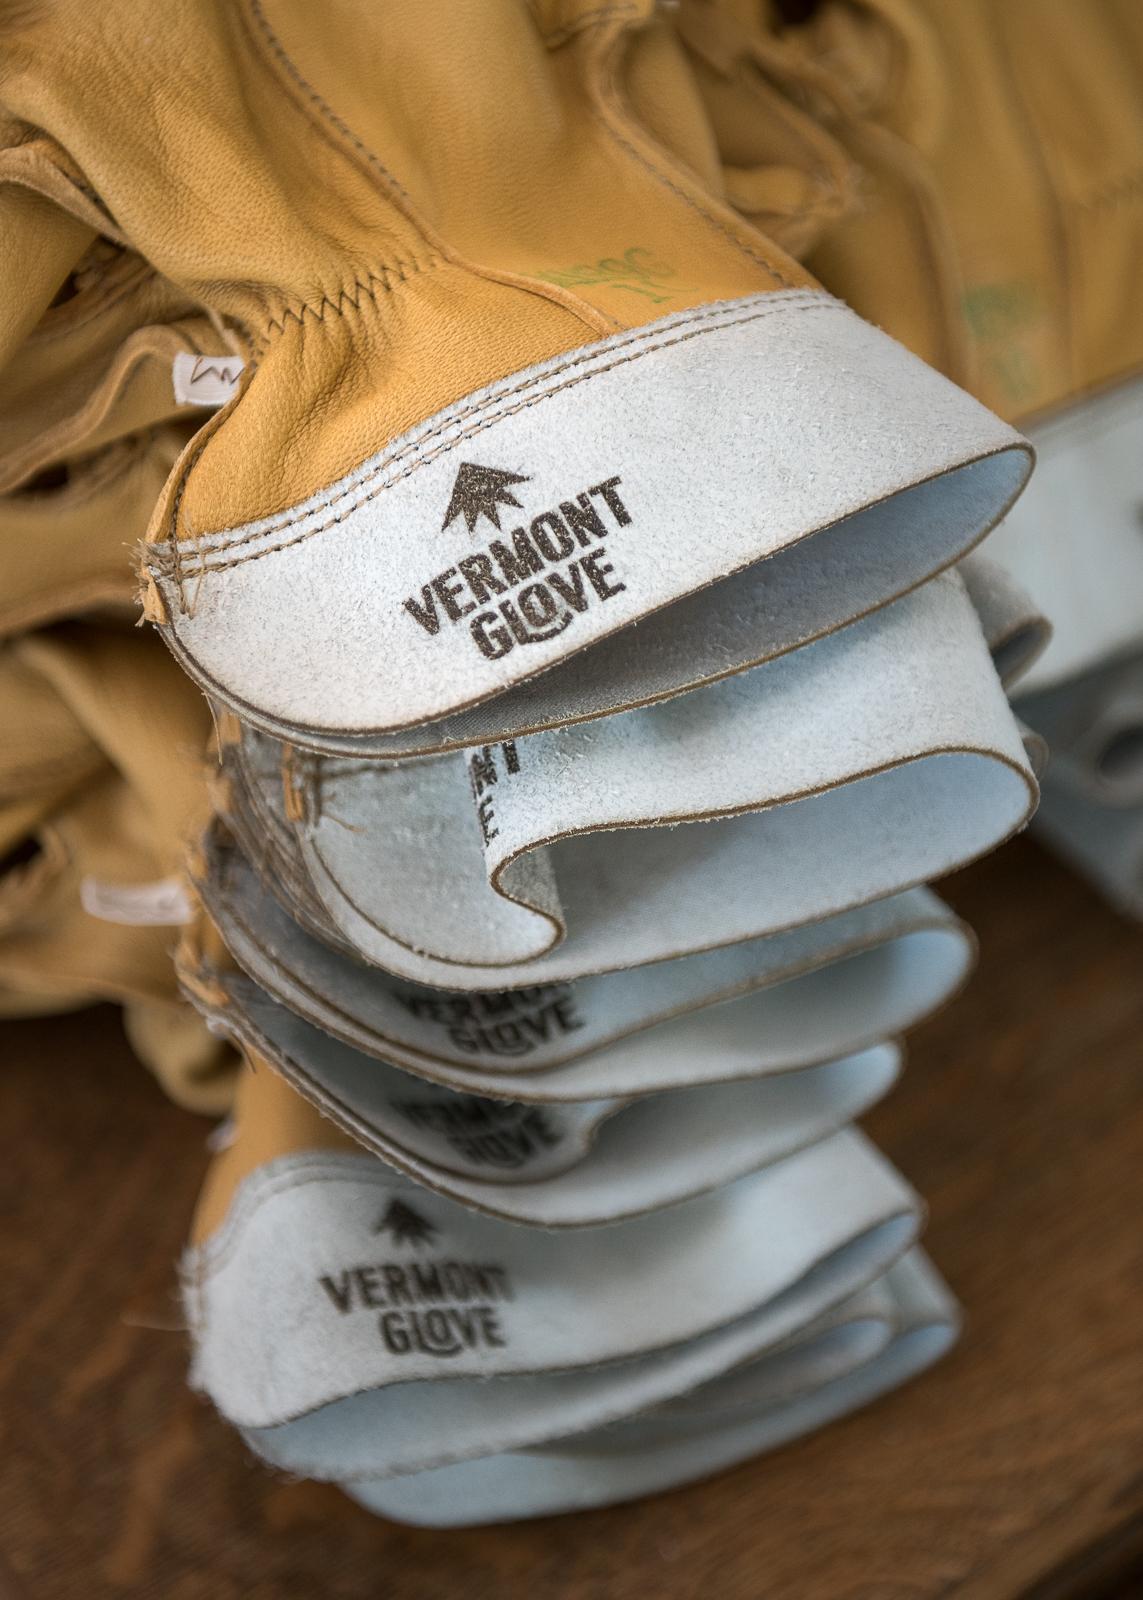 Vermont Glove's new branding.